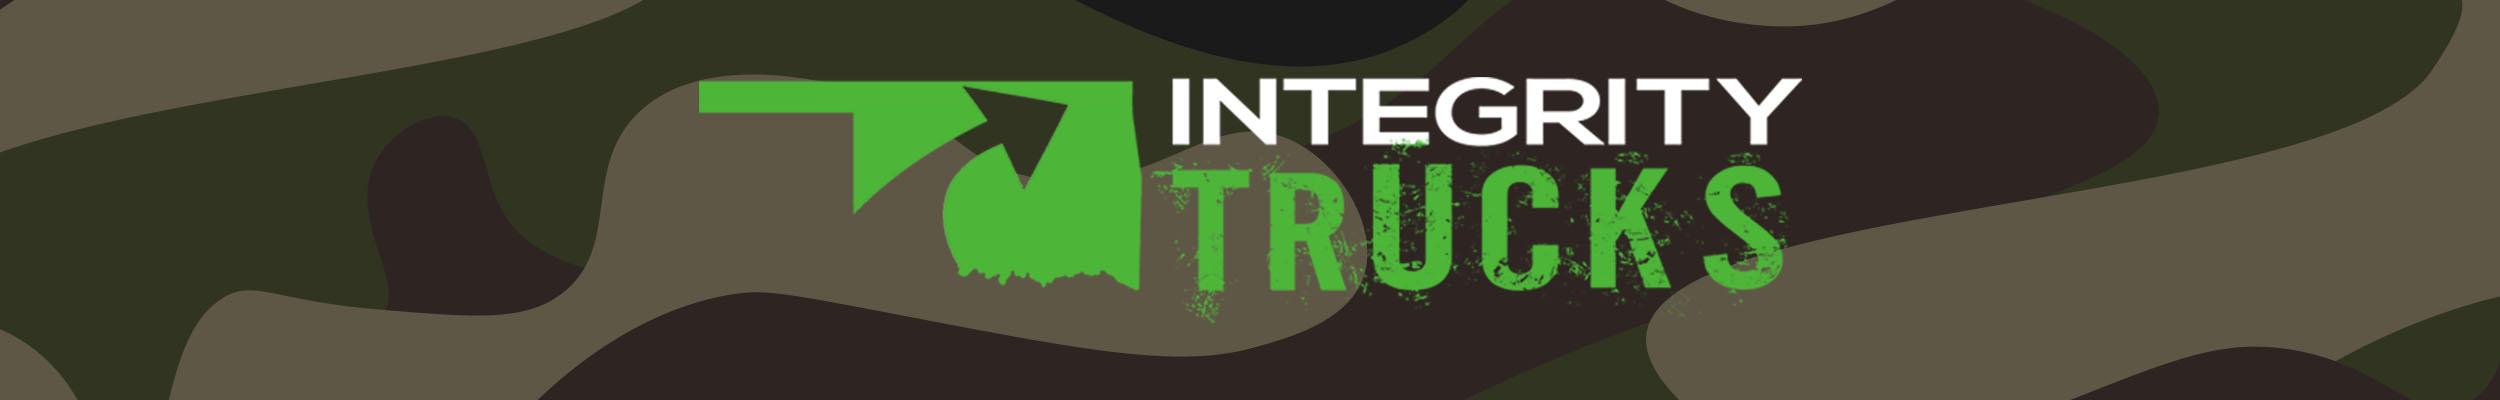 integrity-trucks-2500